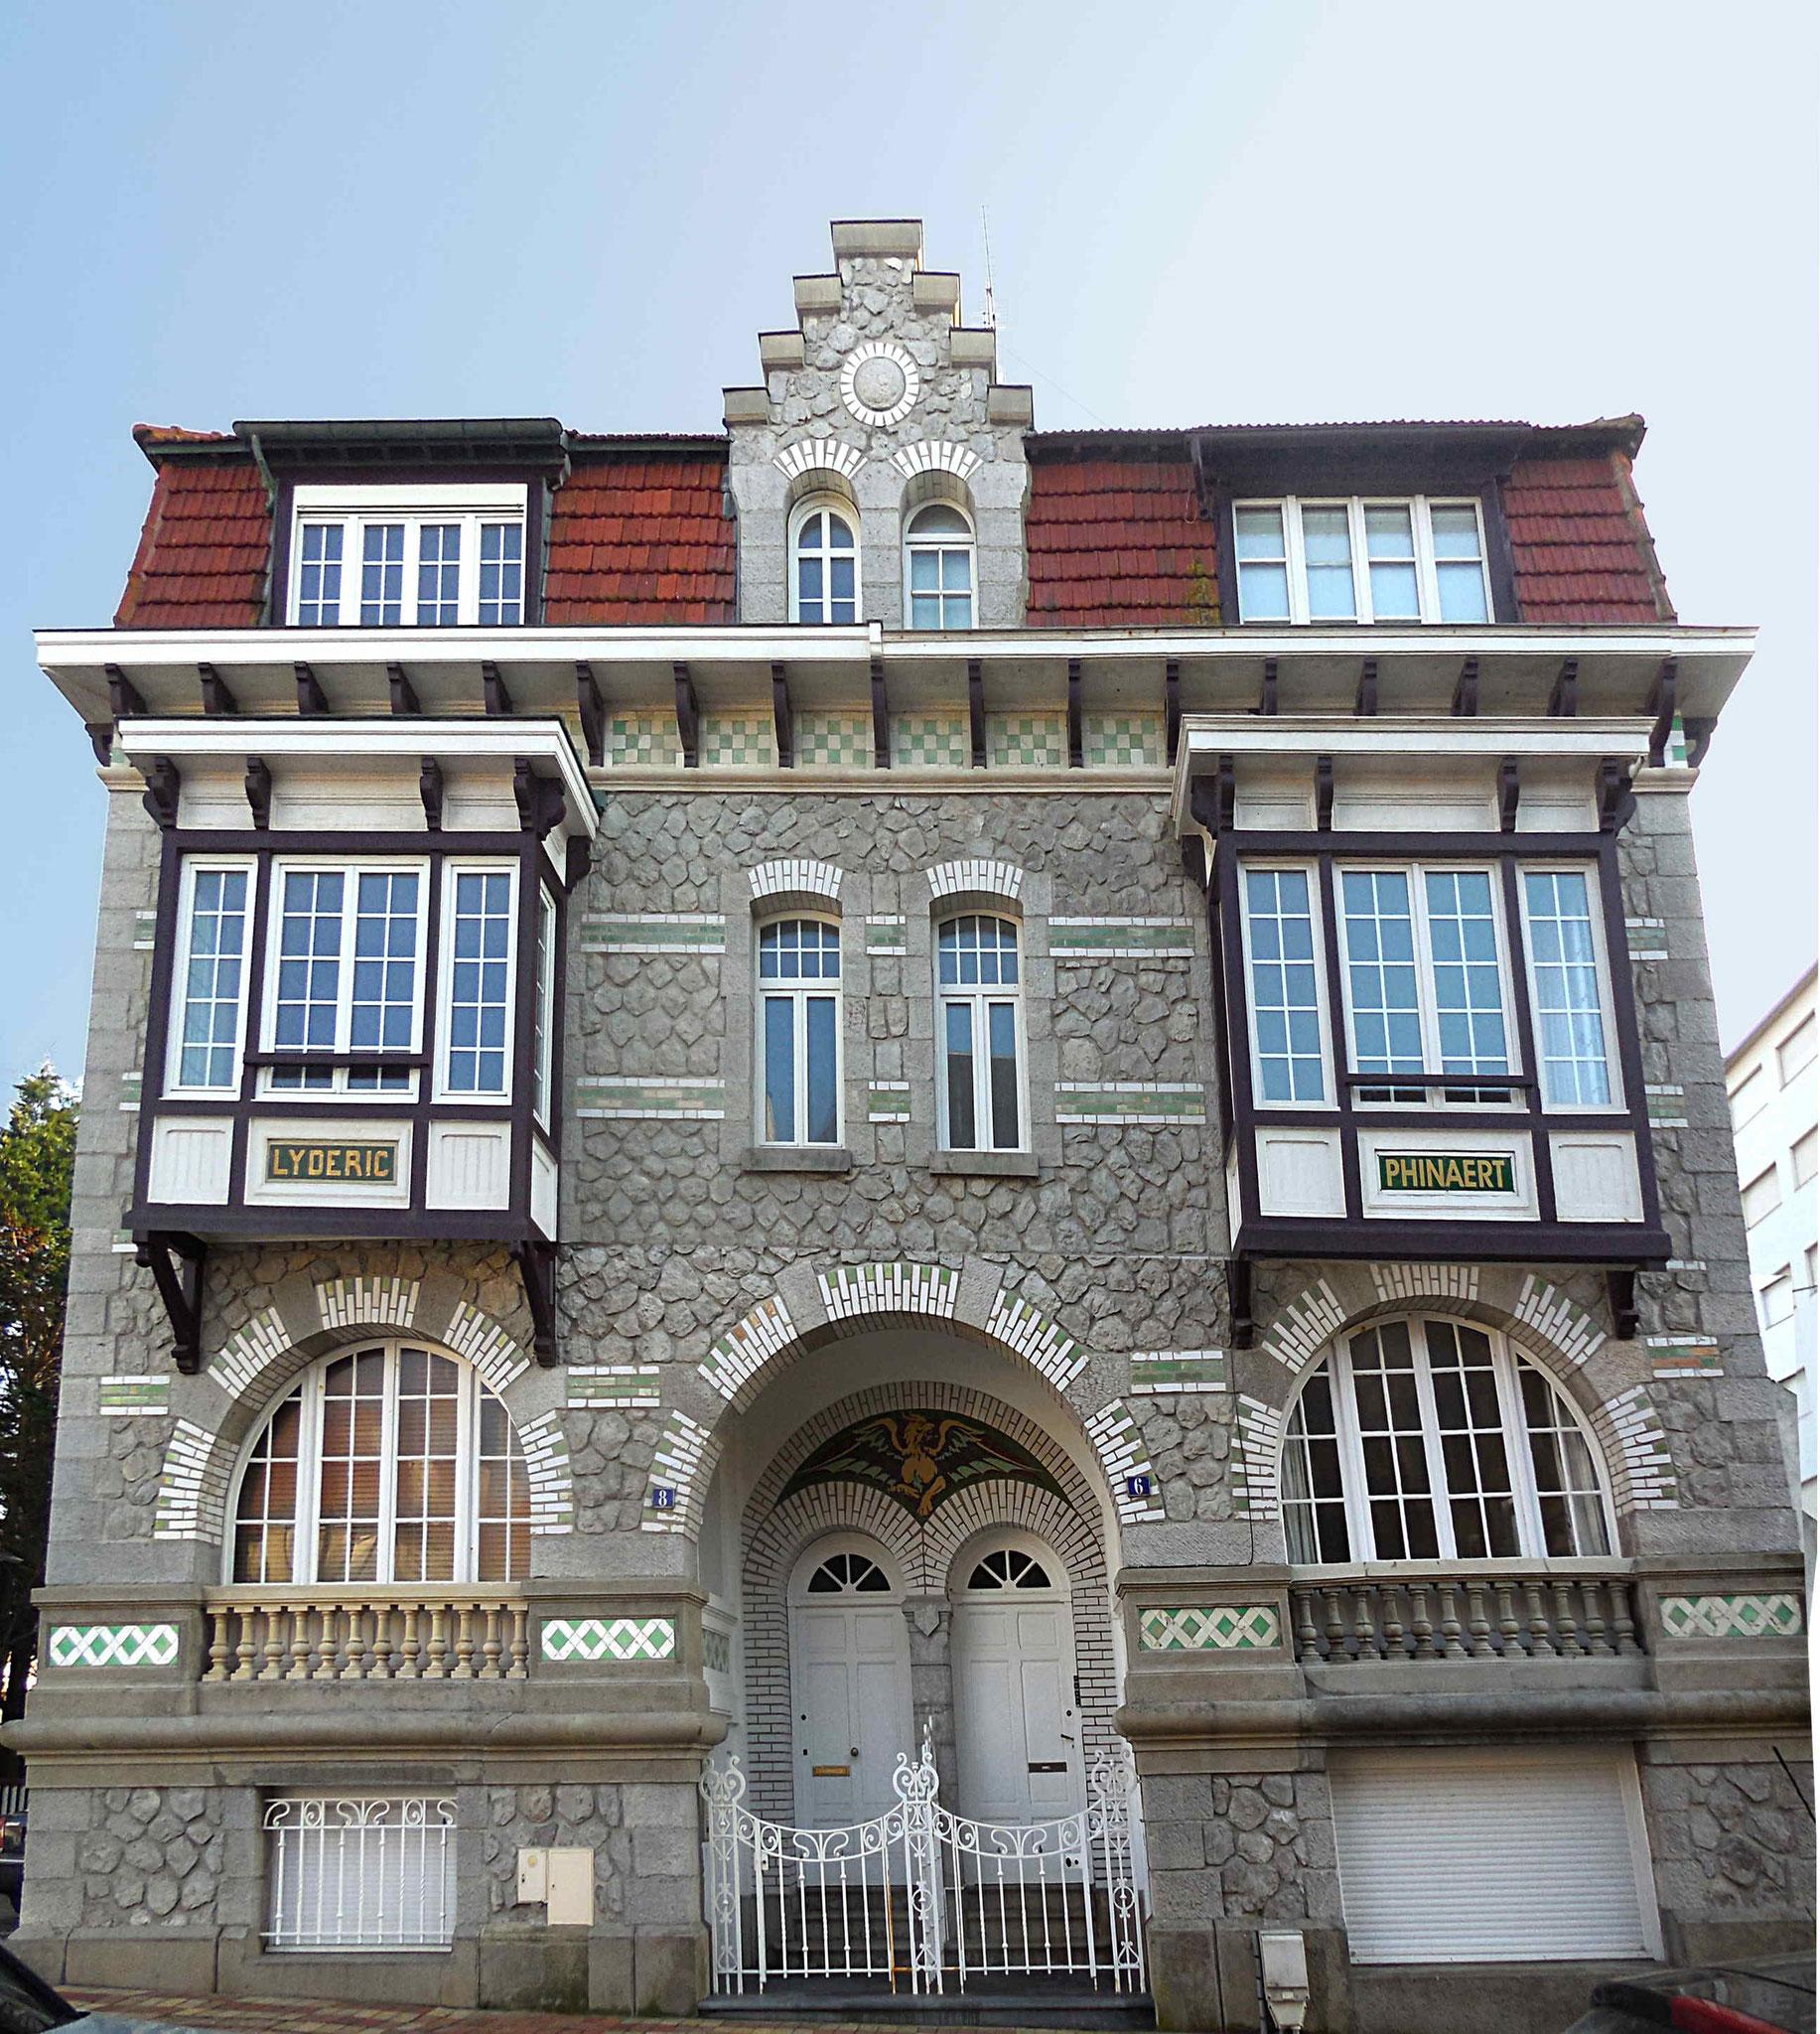 Villas Lydéric et Phinaert